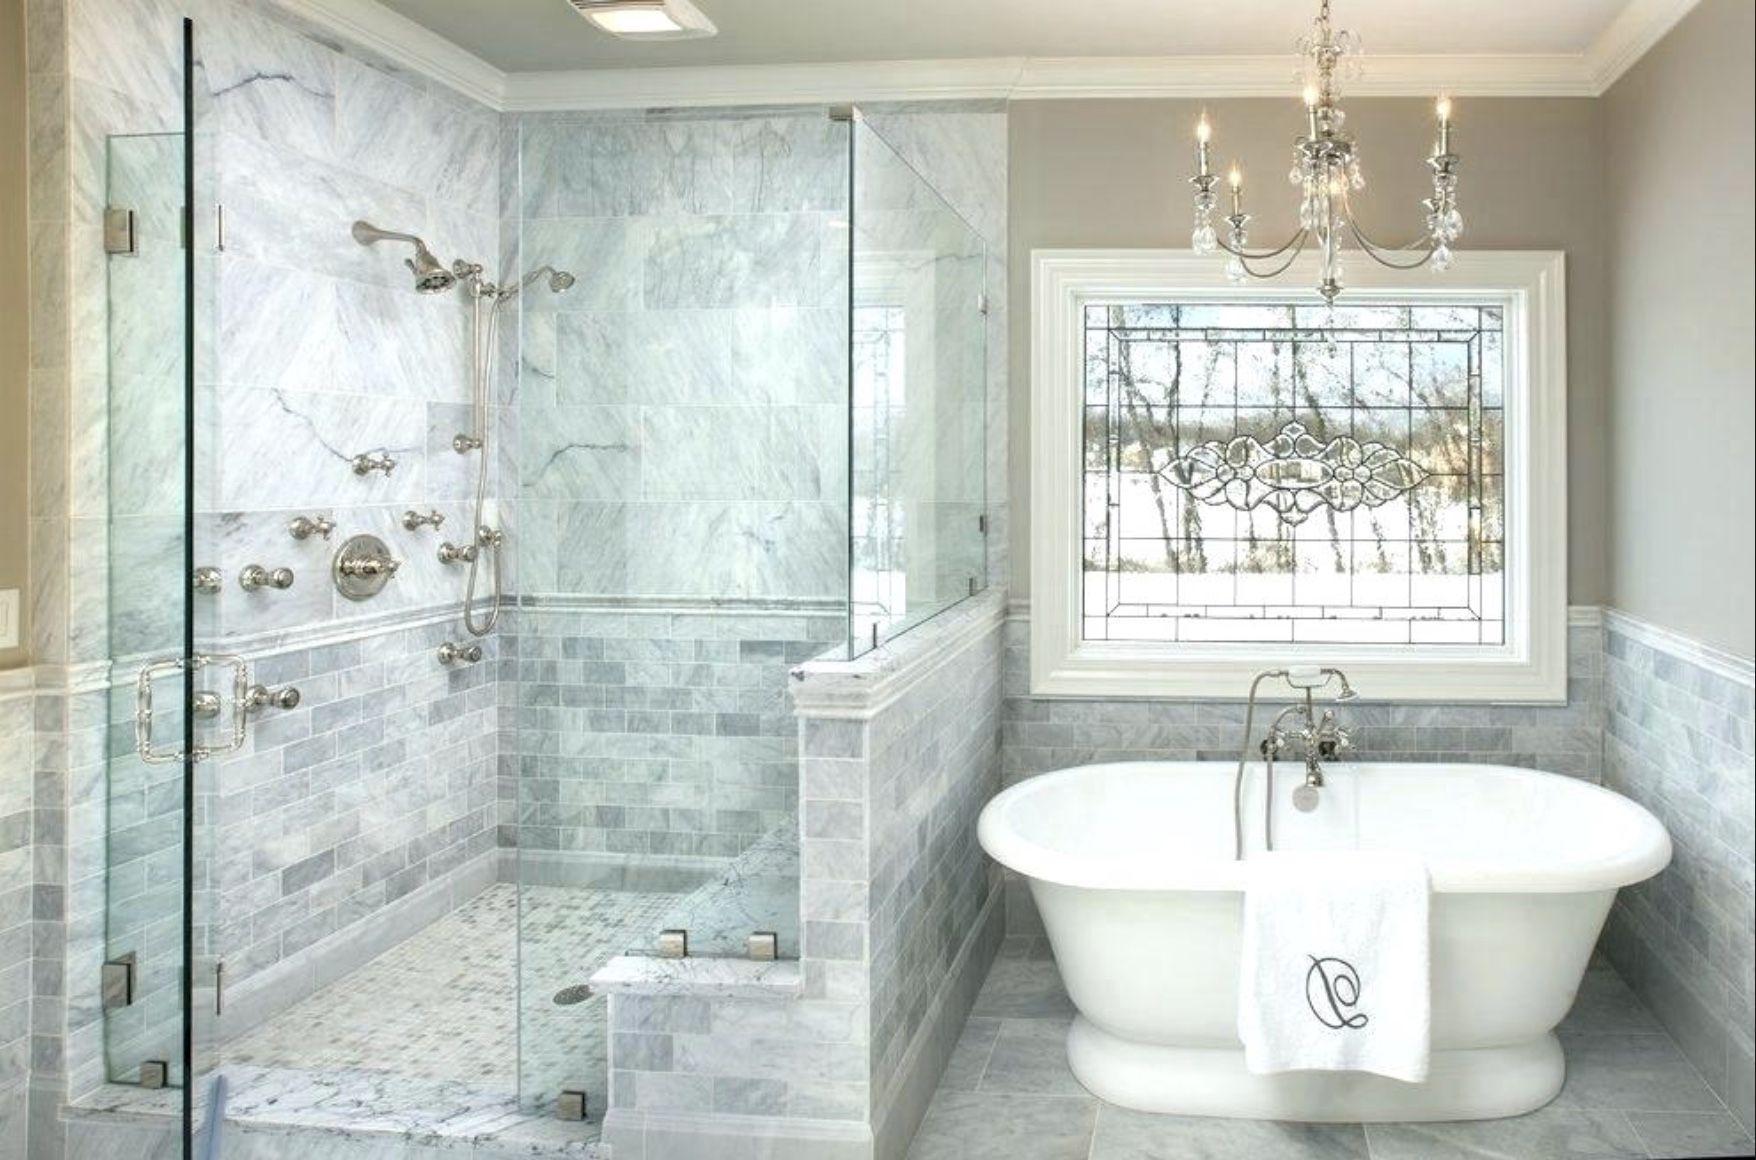 Shower Pony Wall Half Wall Shower Traditional Bathroom Marble Bathroom